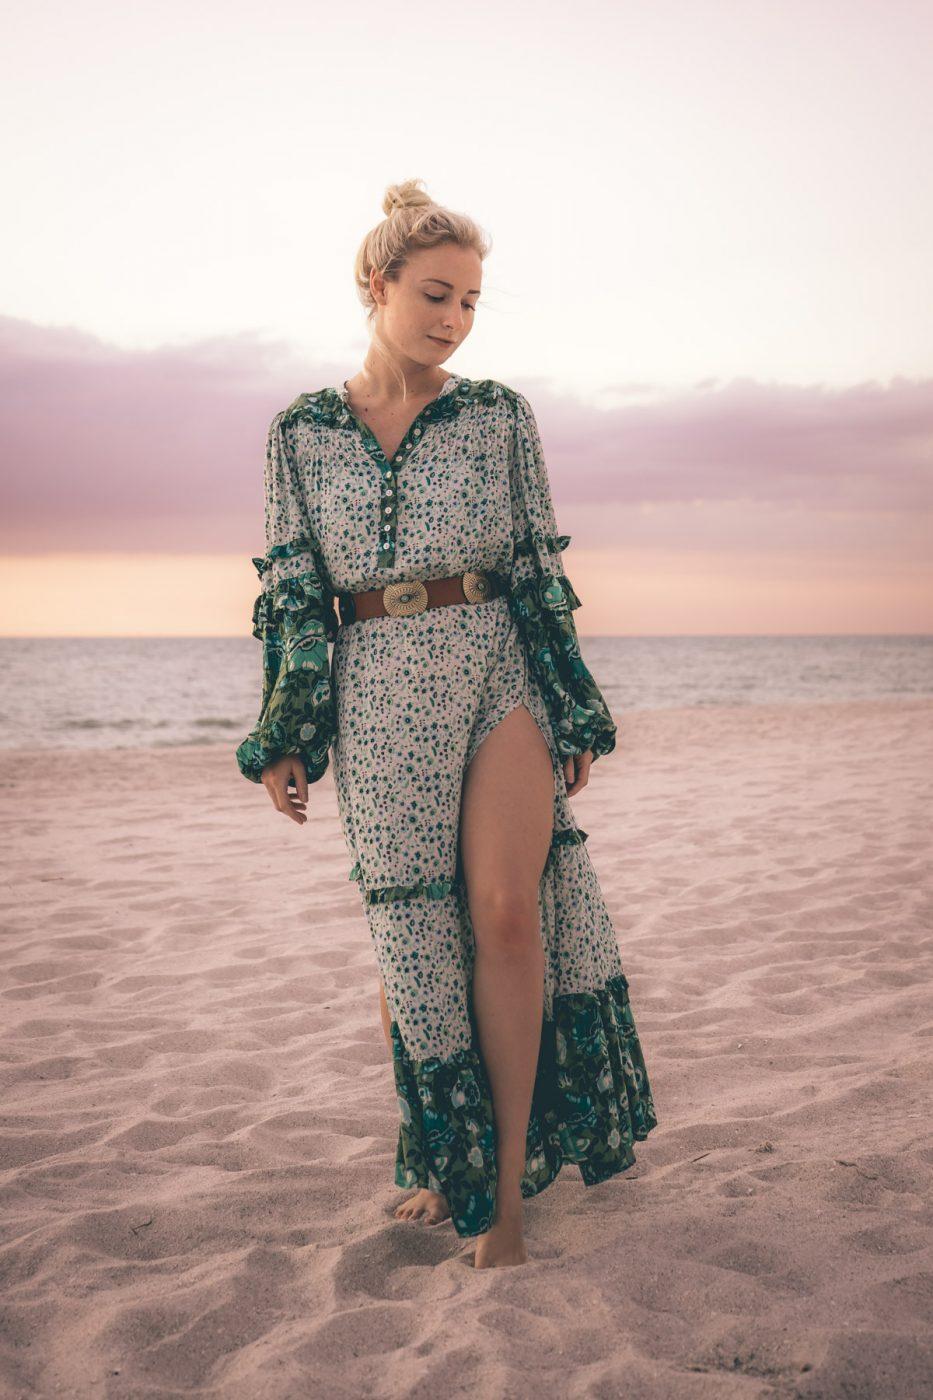 Jenny Bess wearing Spell & The Gypsy Winona Boho Maxi Dress in Ivy - Sweet Teal